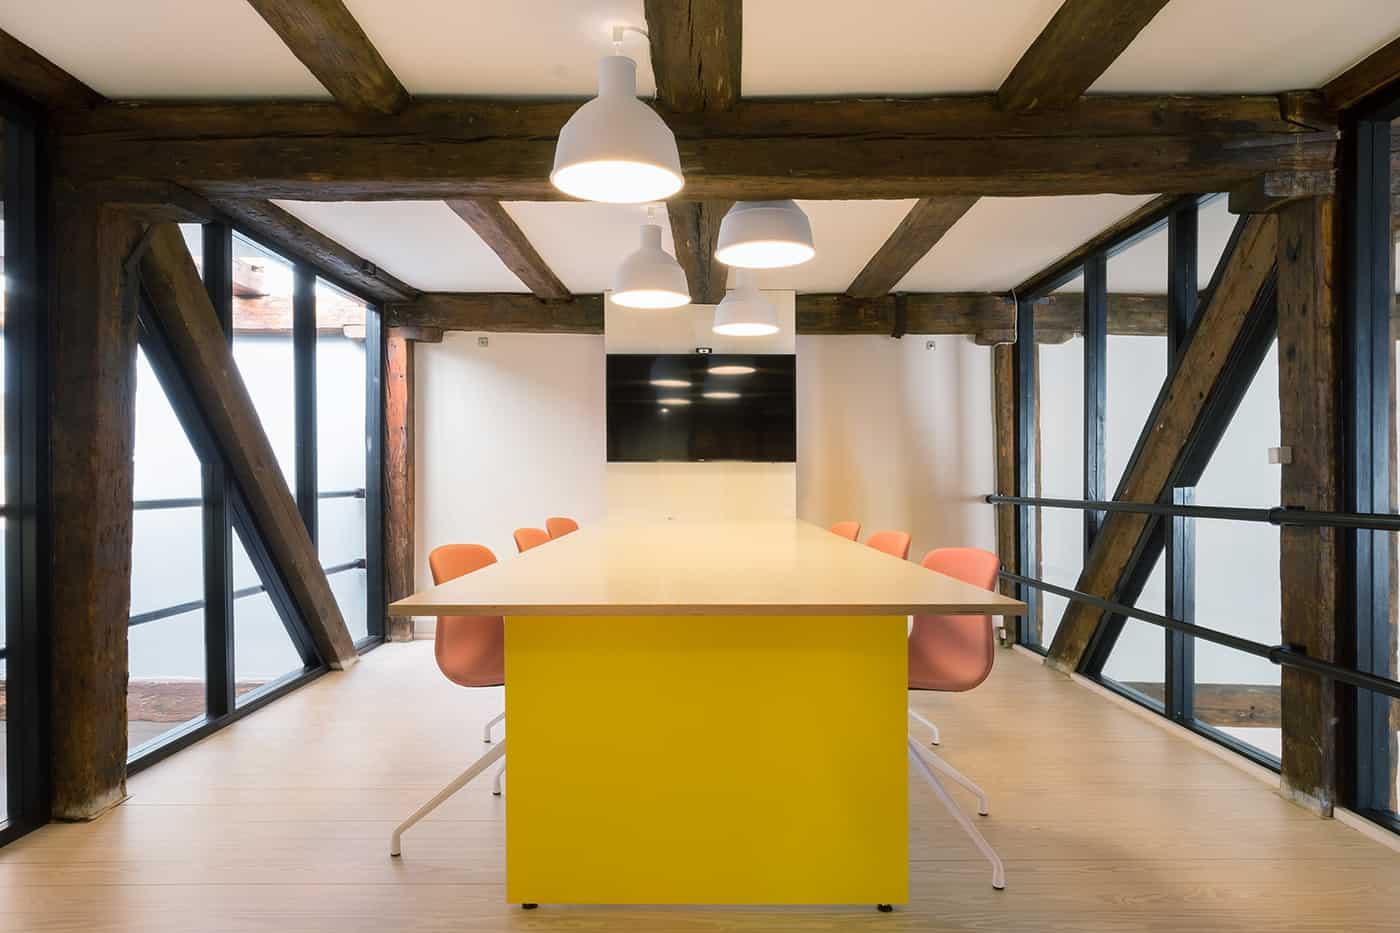 RITAarch, Greener Pastures, indretning, mødelokaler, specialinventar, specialdesign, transformation